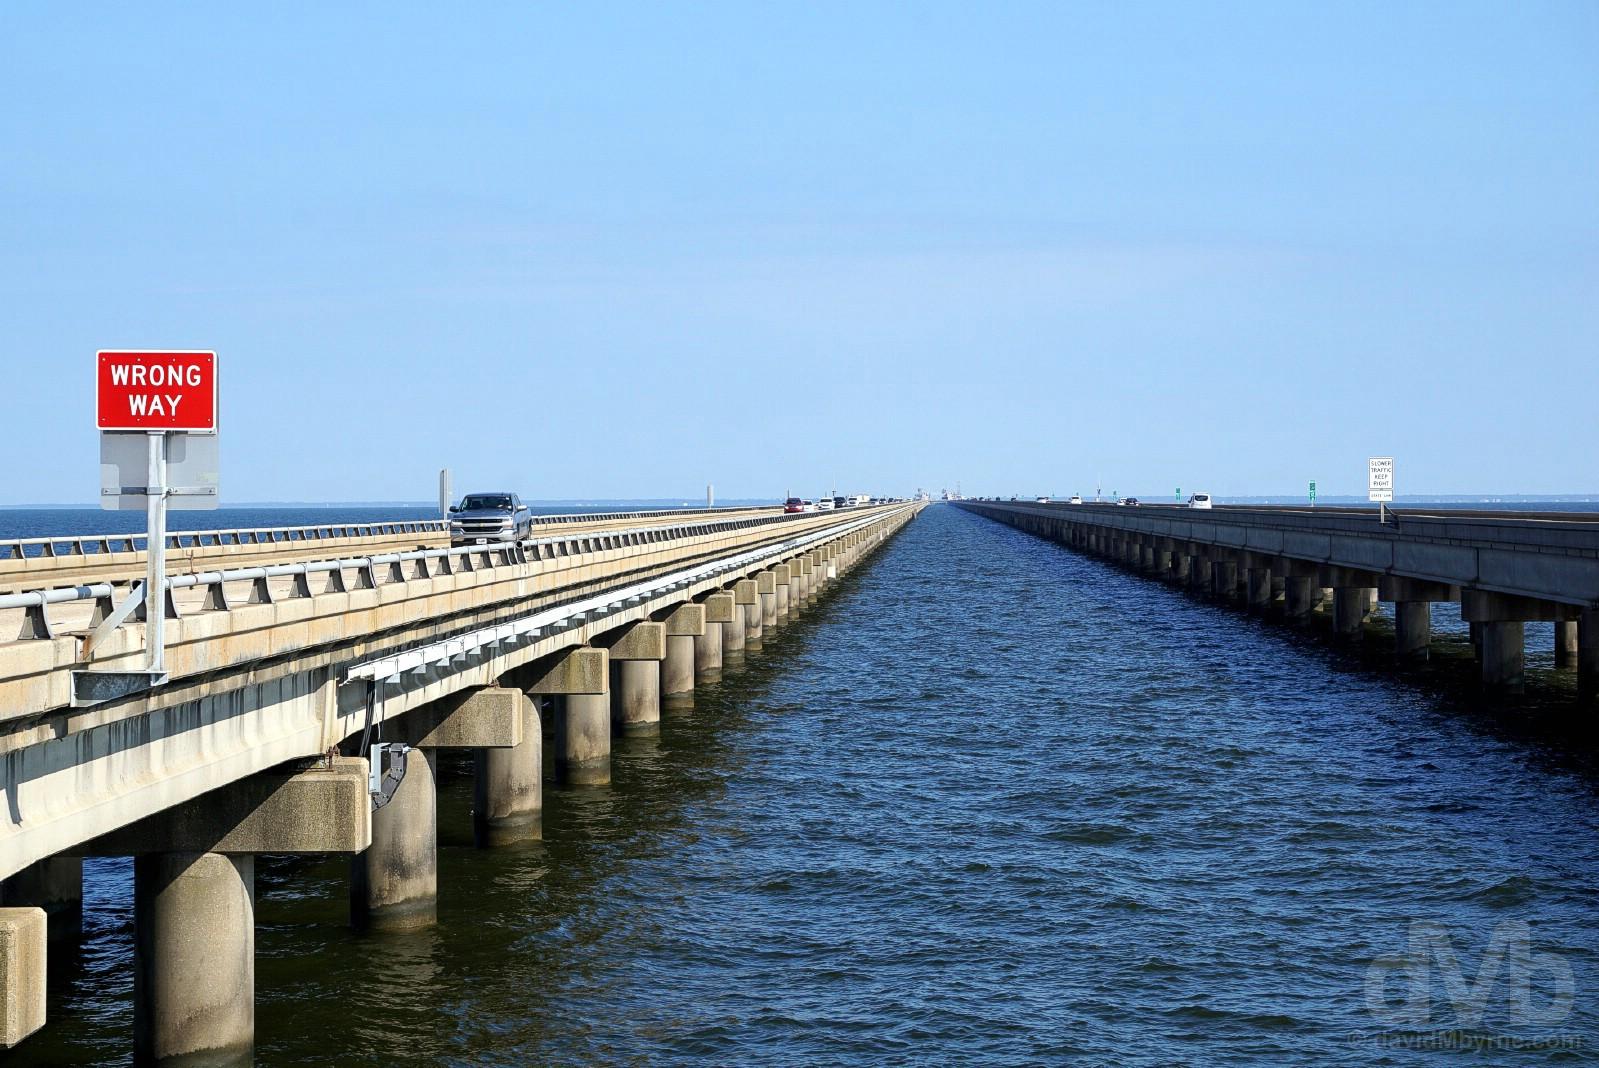 The Lake Pontchartrain Causeway, Louisiana. October 13, 2017.